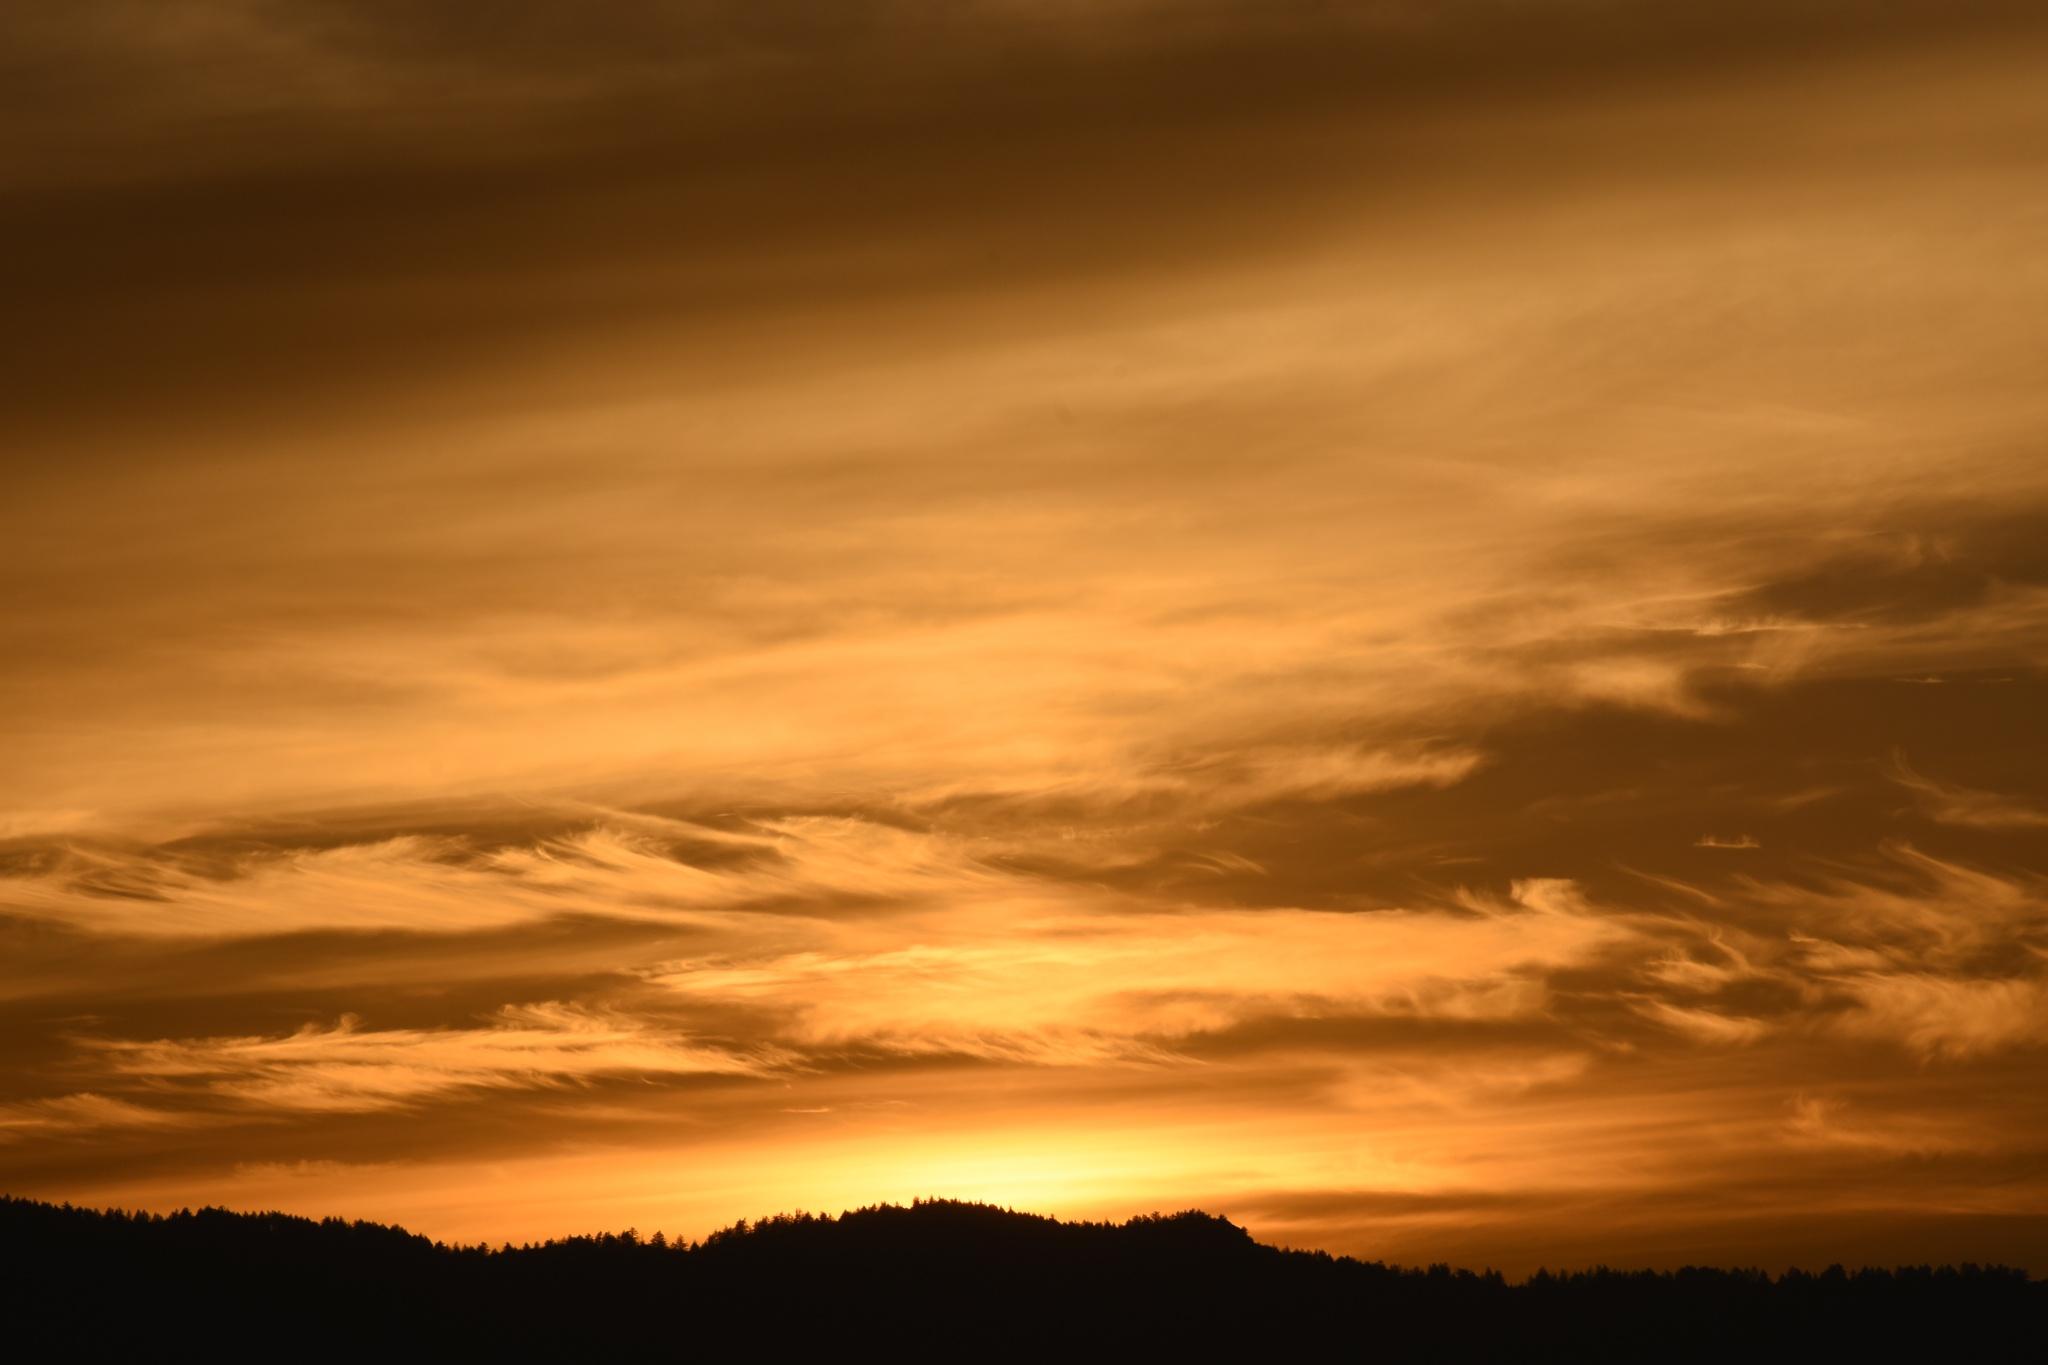 Sunset over the Western Ridge by Gerard Francis Corbett